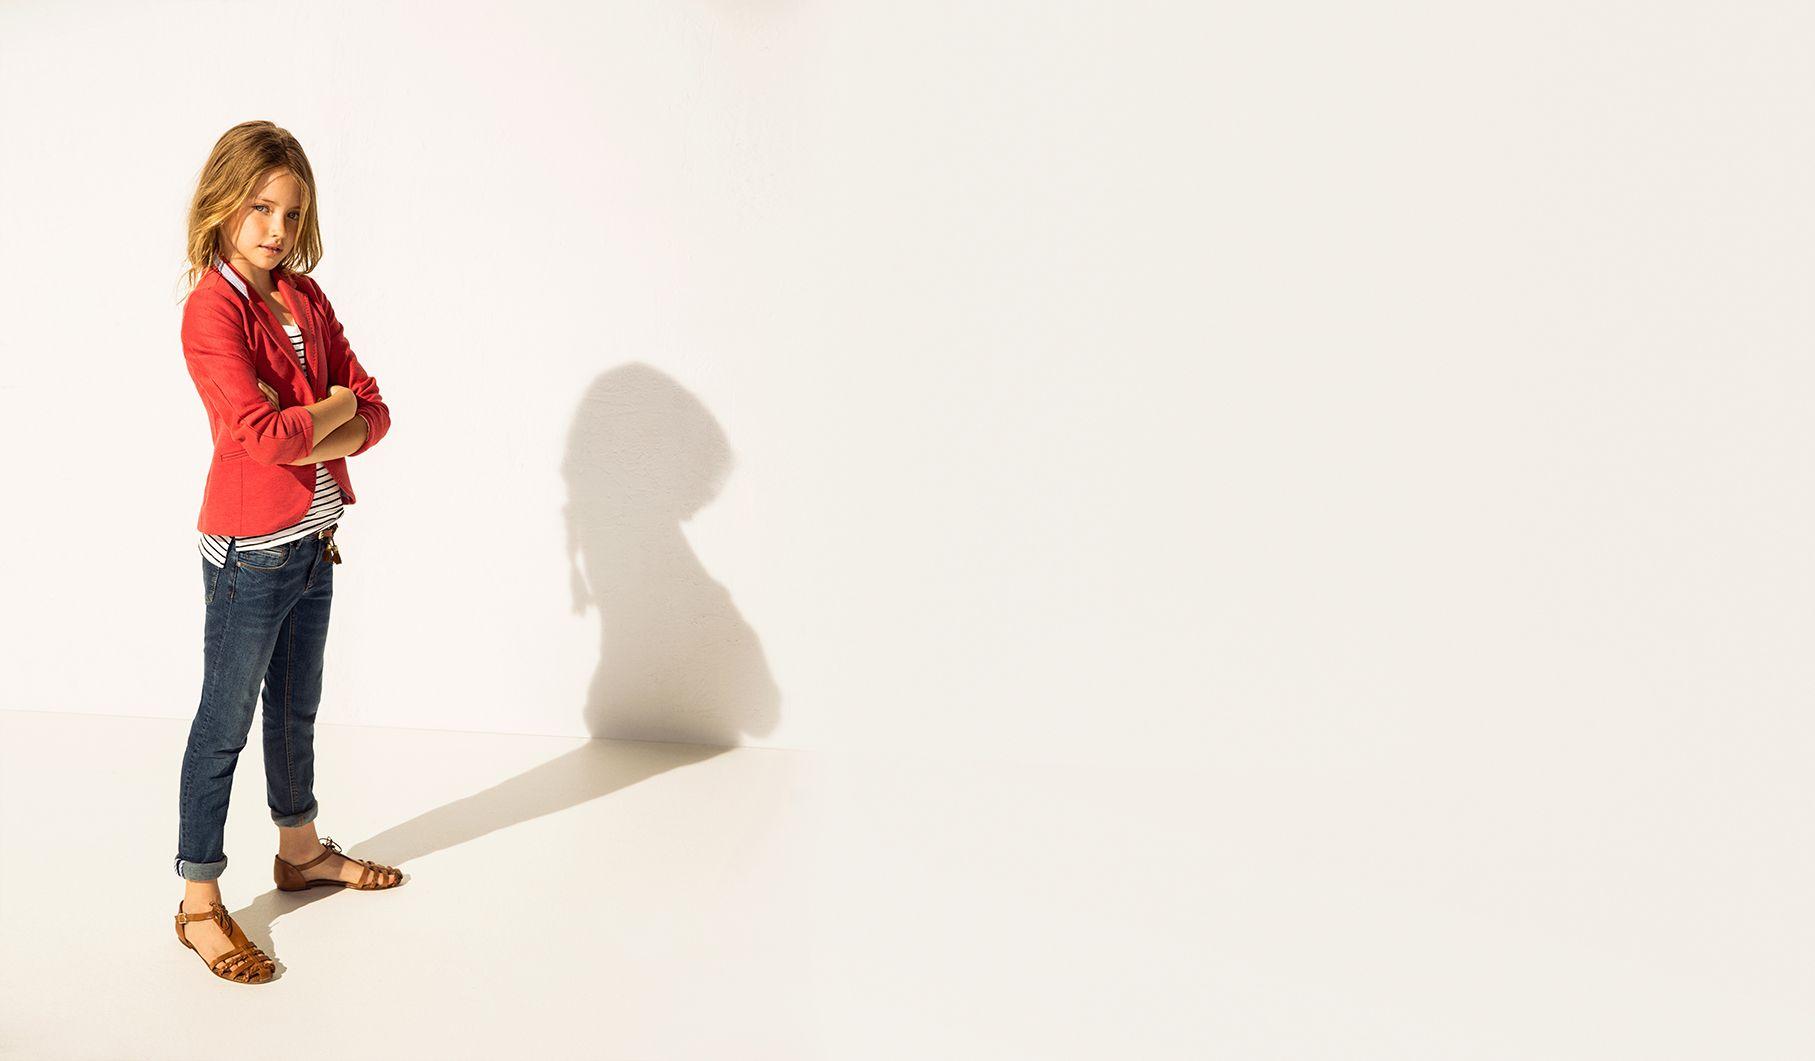 Massimo Dutti - Boys & Girls Collection. Spring Summer 14 - June Lookbook